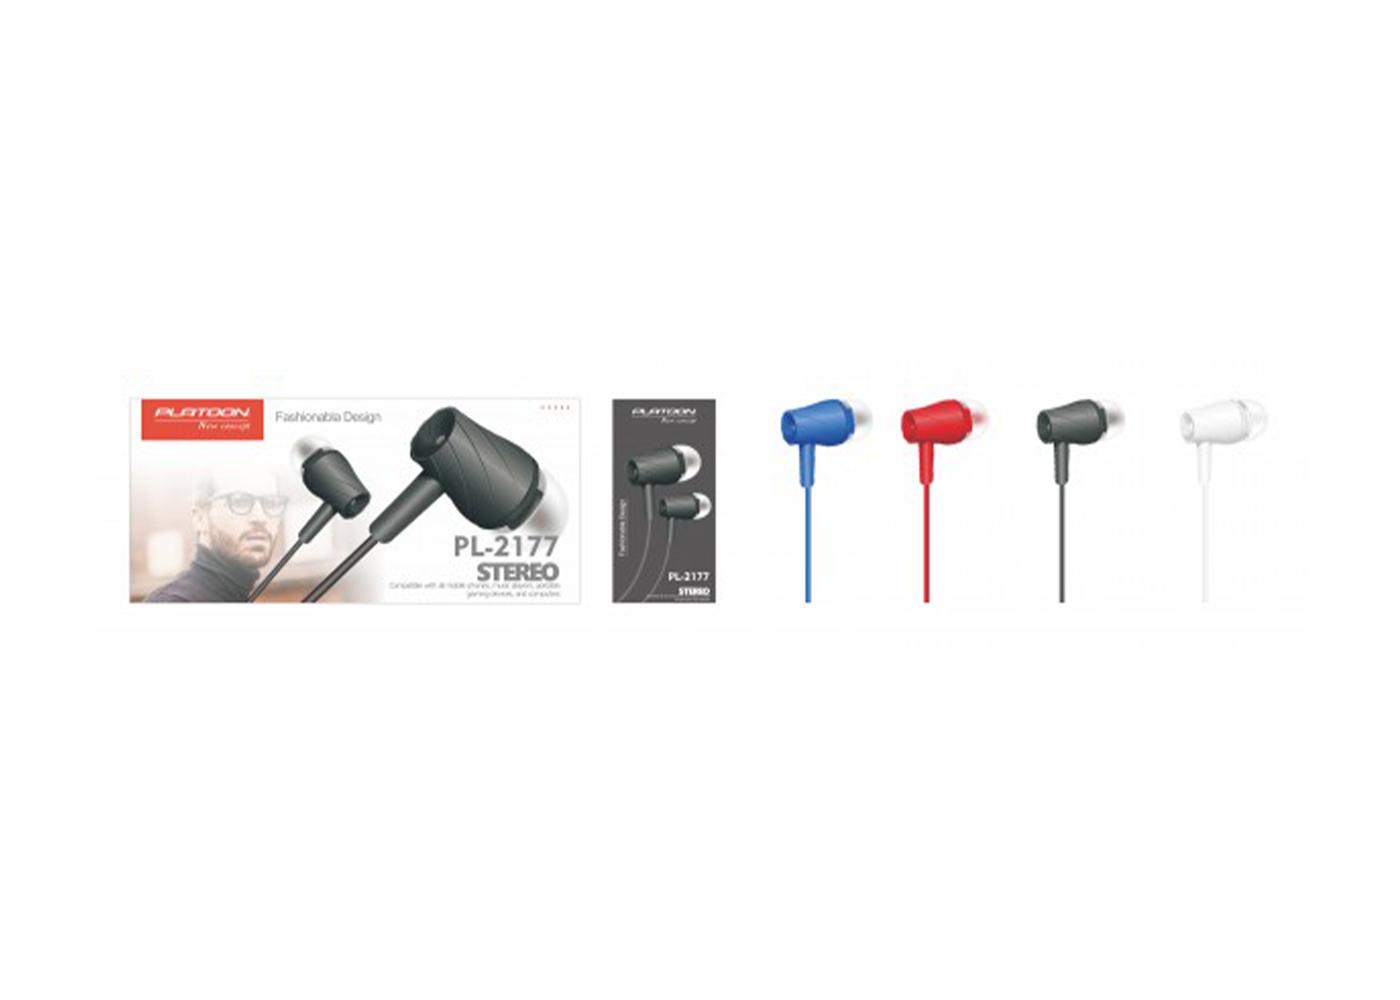 Platoon PL-2177 40 Lı Stand Mikrofonlu MP3 Kulaklık